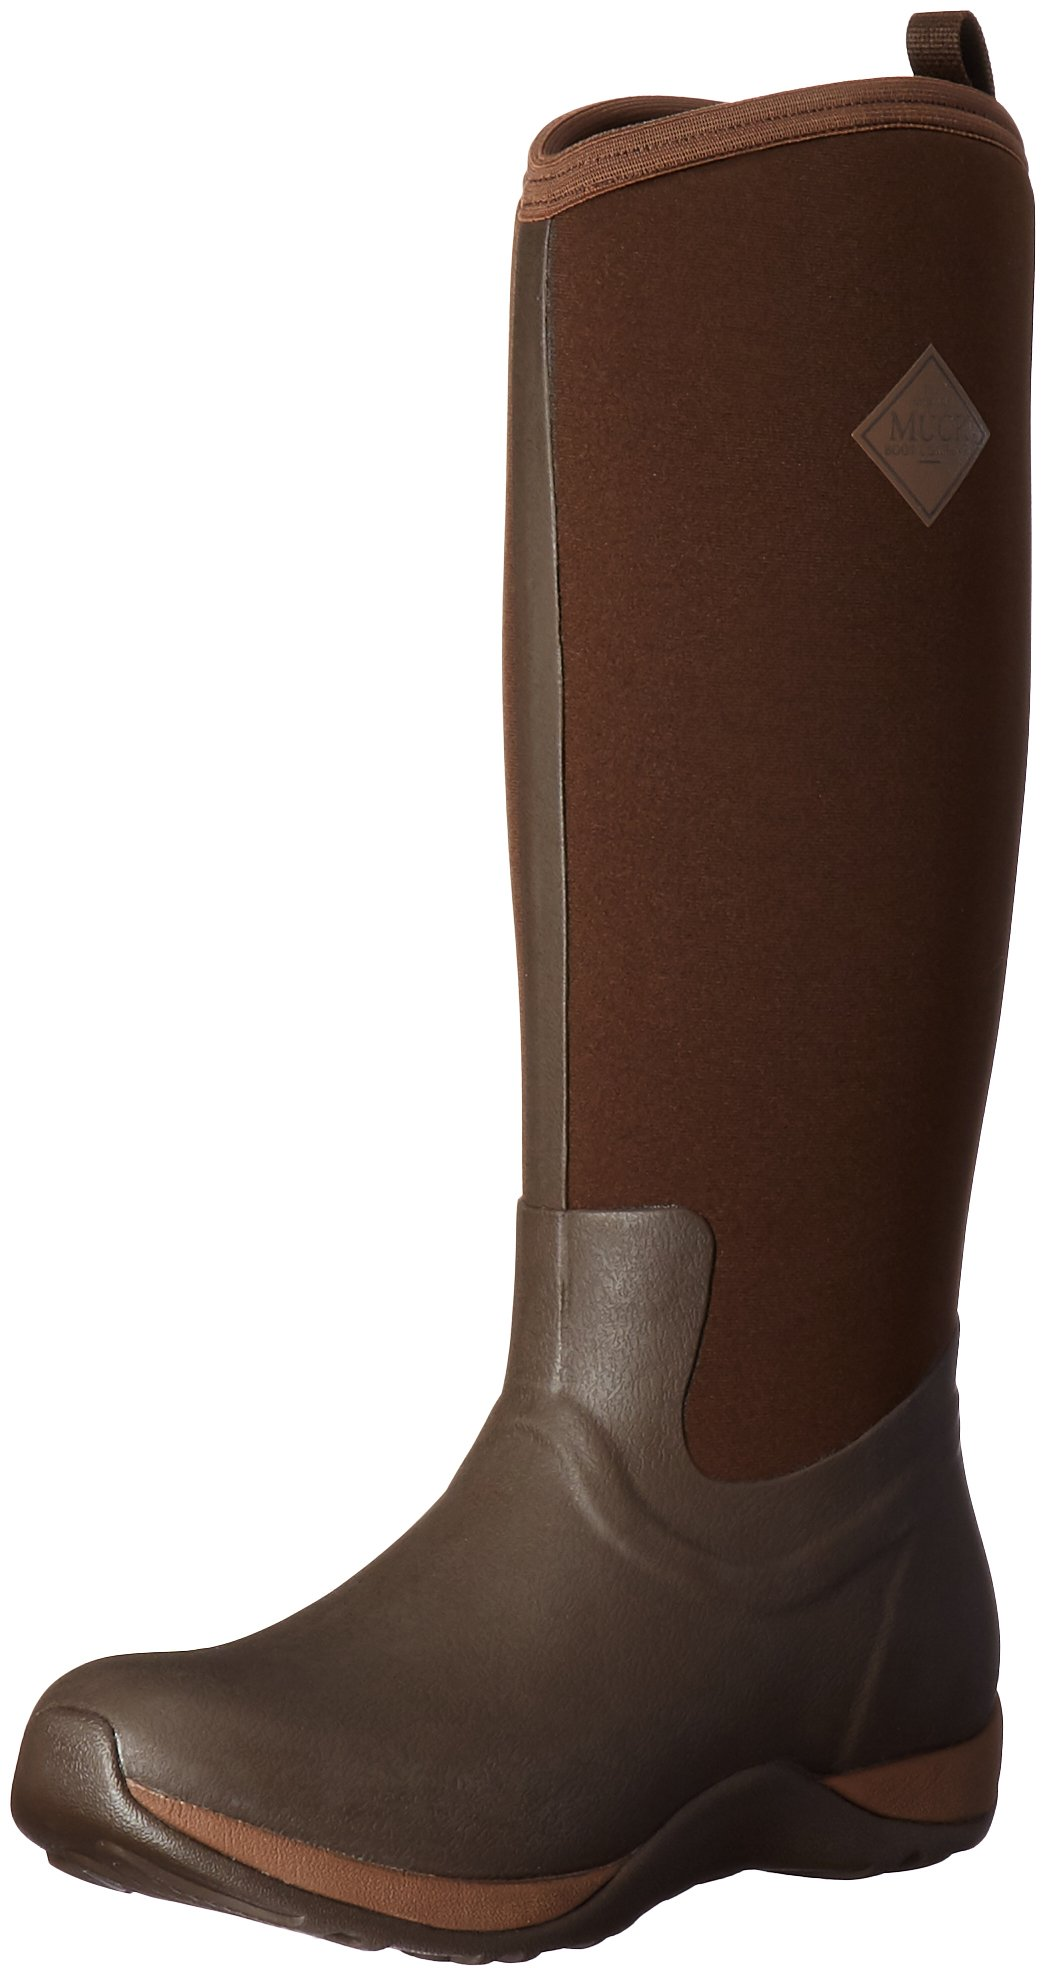 MuckBoots Women's Artic Adventure Snow Boot,Chocolate,7 M US